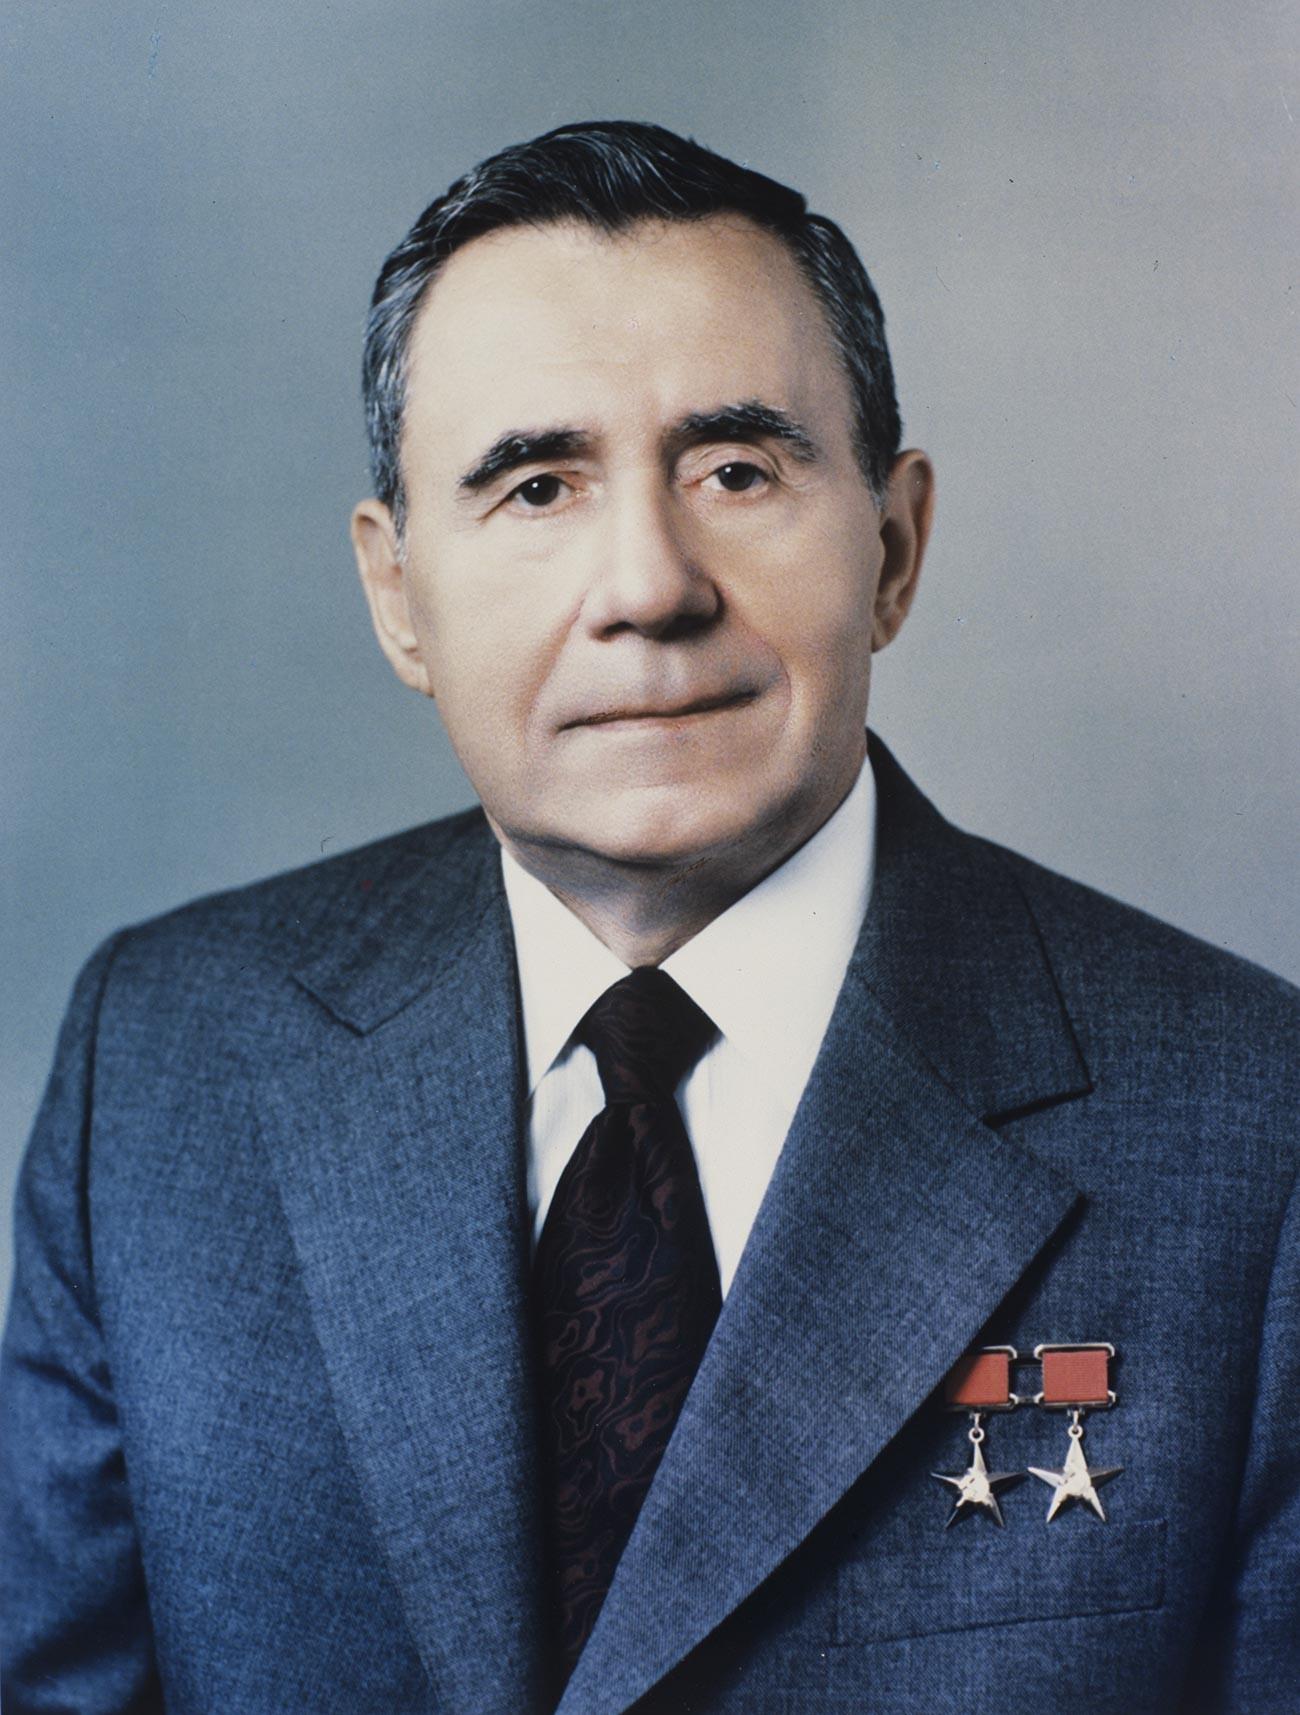 Andrey Gromyko menjadikan namanya sebagai salah satu diplomat kebijakan luar negeri Rusia yang paling mengesankan.